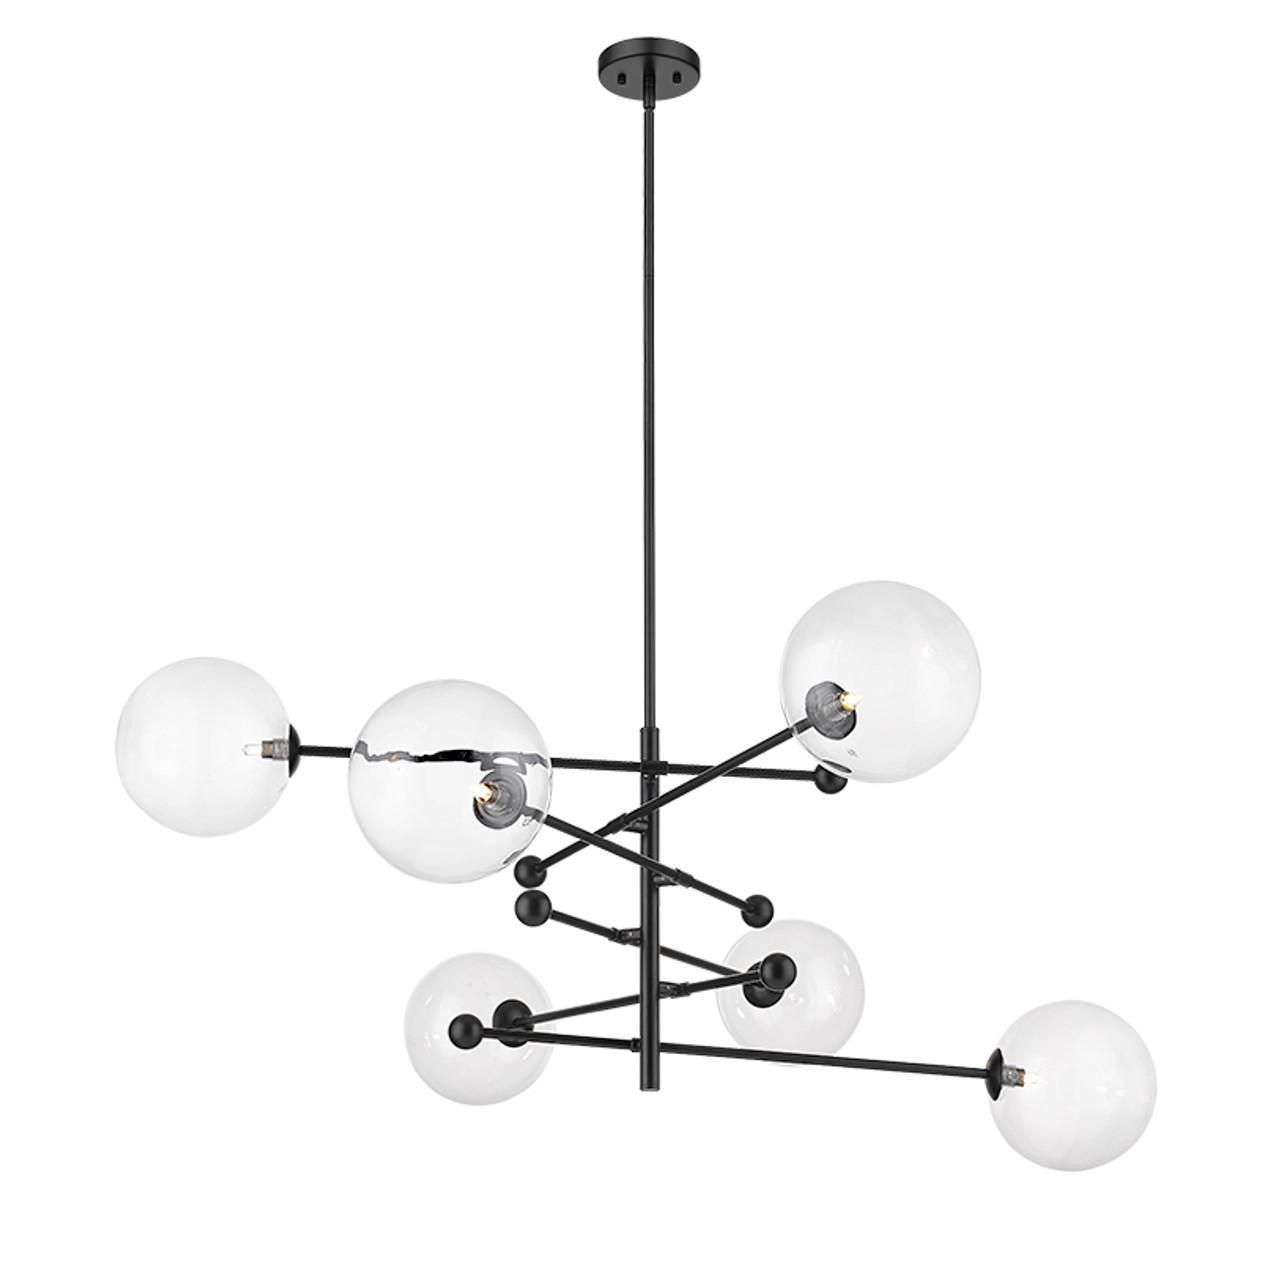 new york 6 light black modern pendant by mirage lighting